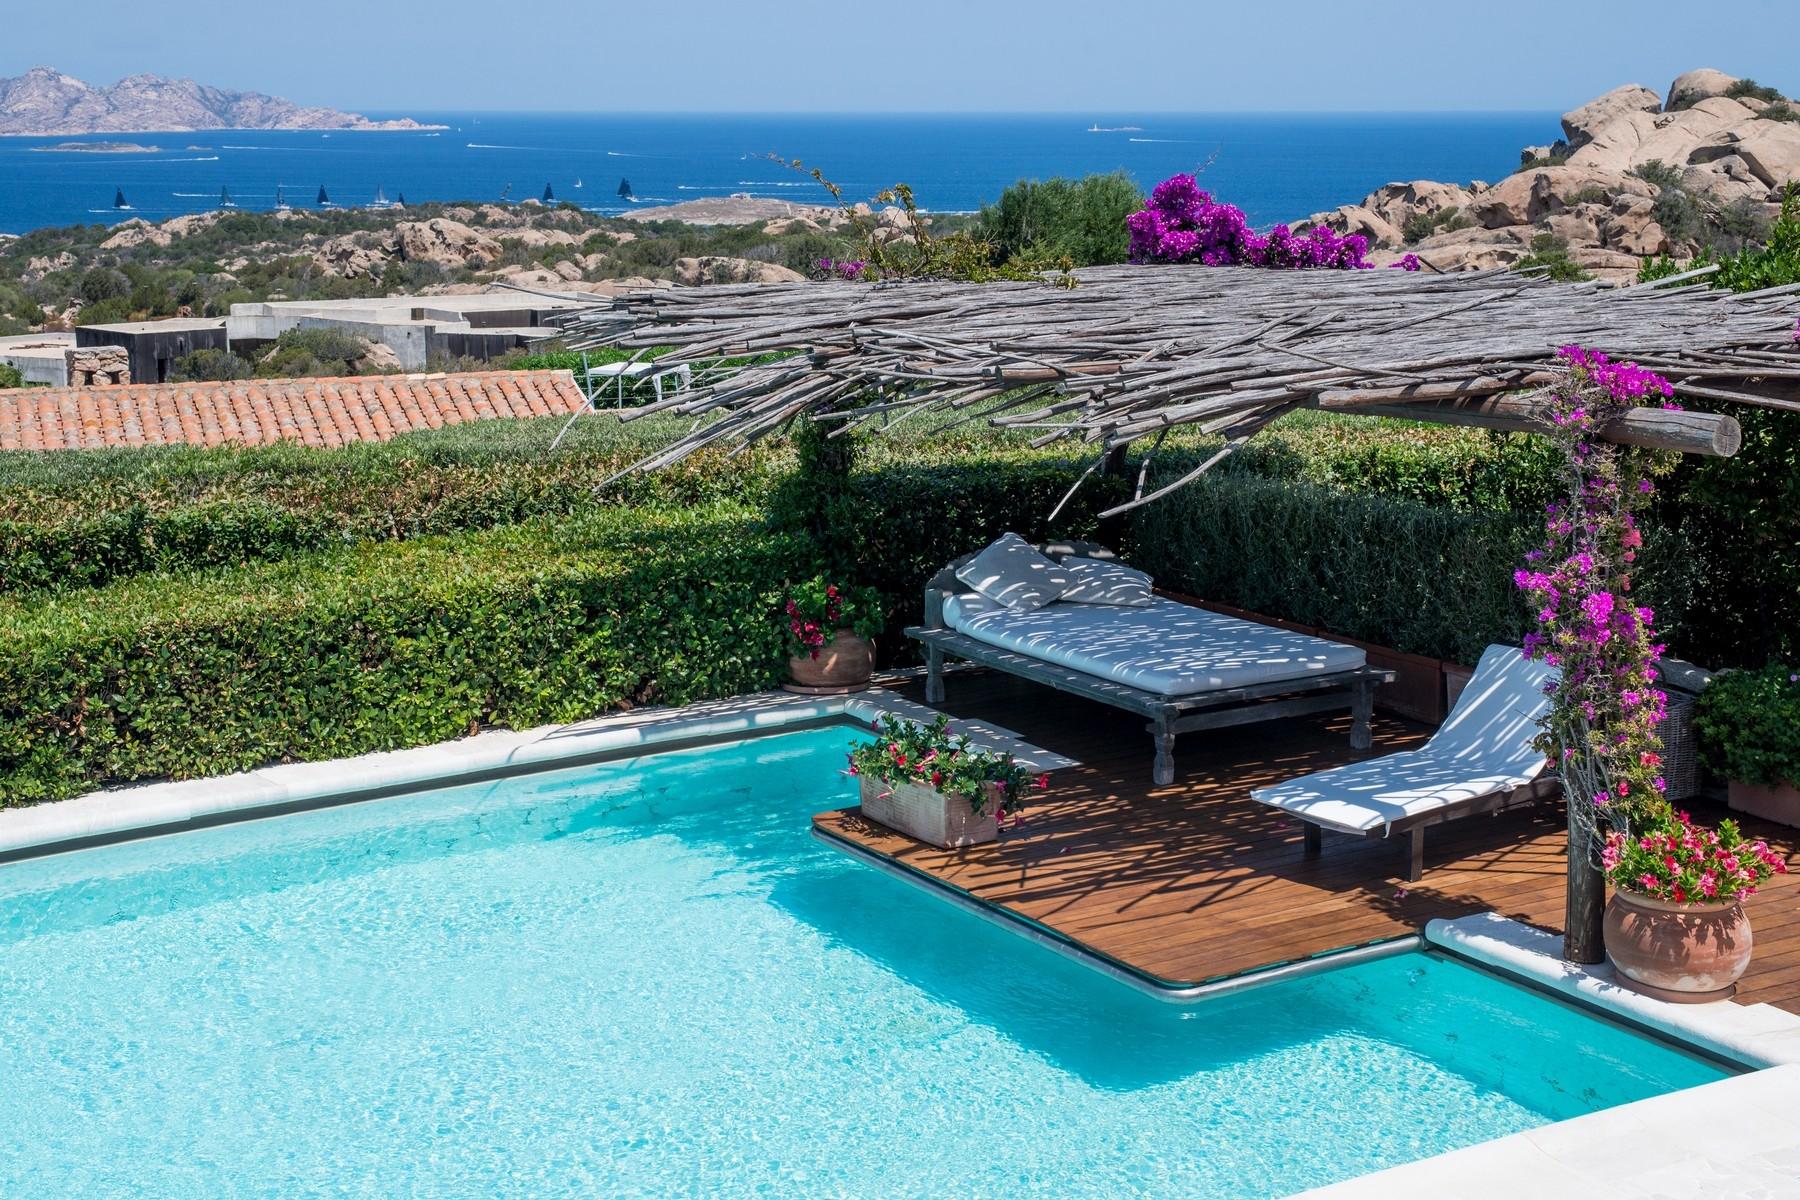 Other Residential for Sale at Superb detached villa in Liscia di Vacca Porto Cervo, Olbia Tempio, Italy